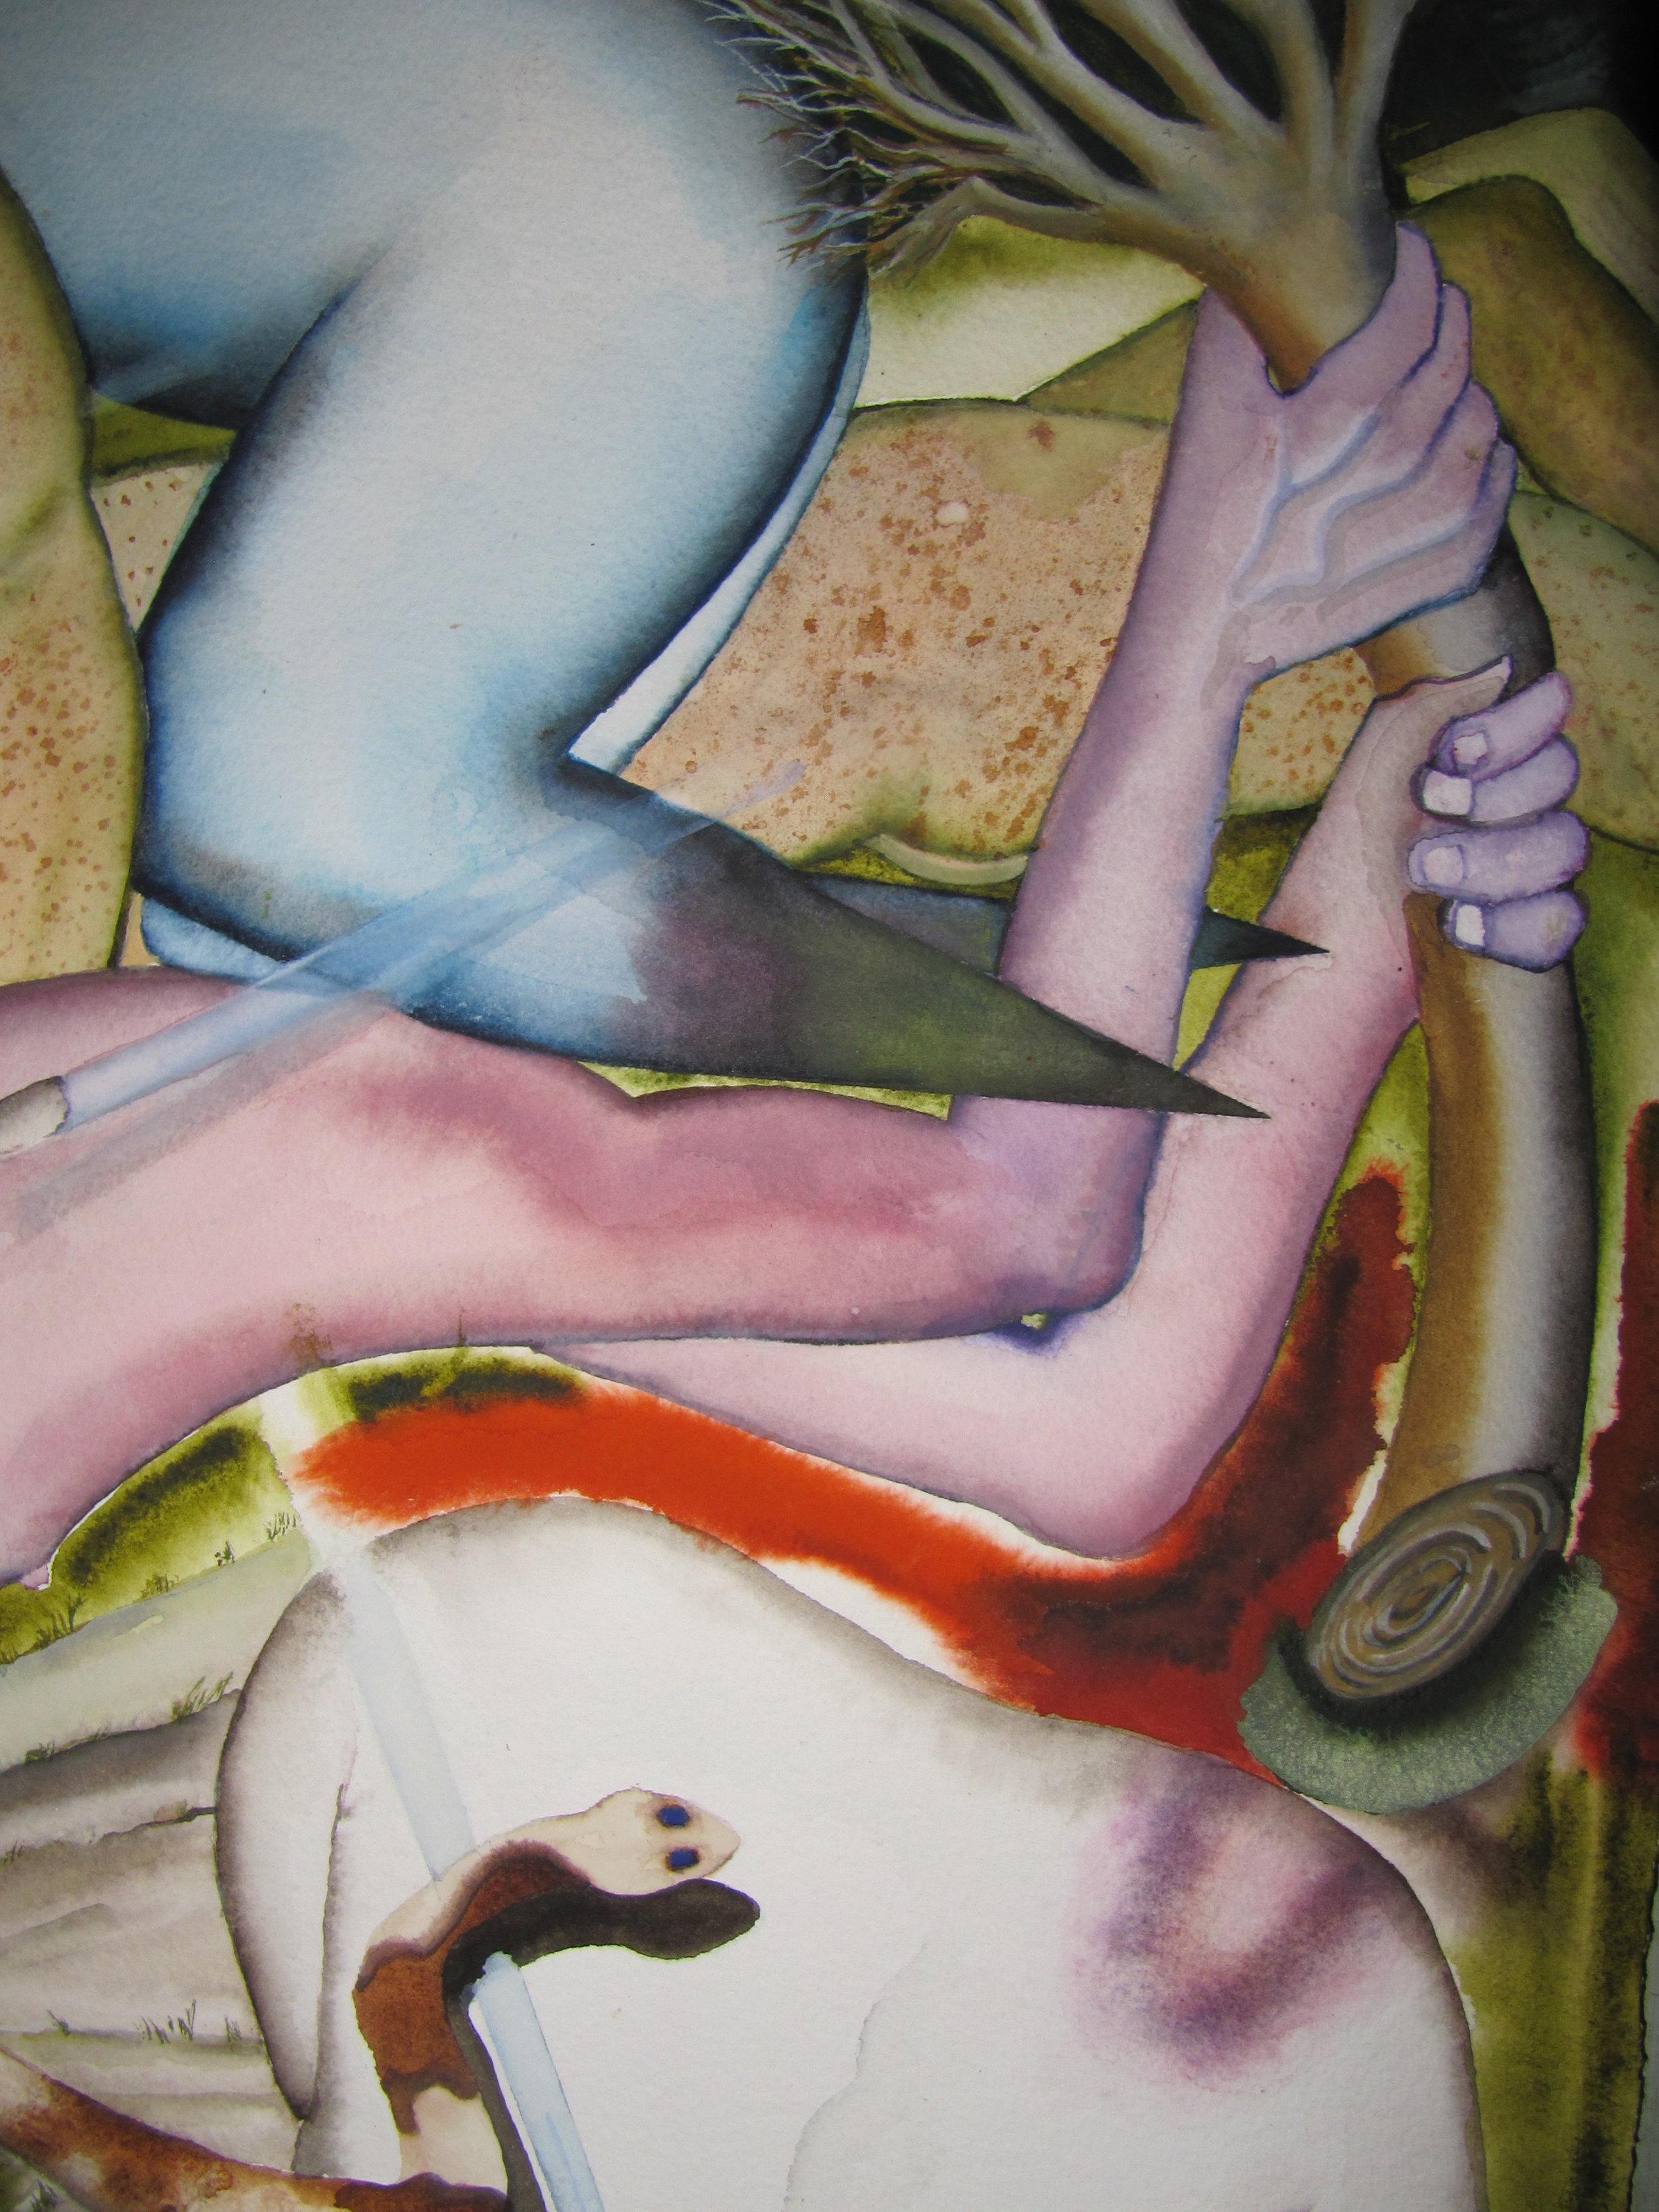 Detail, White man wounding white man